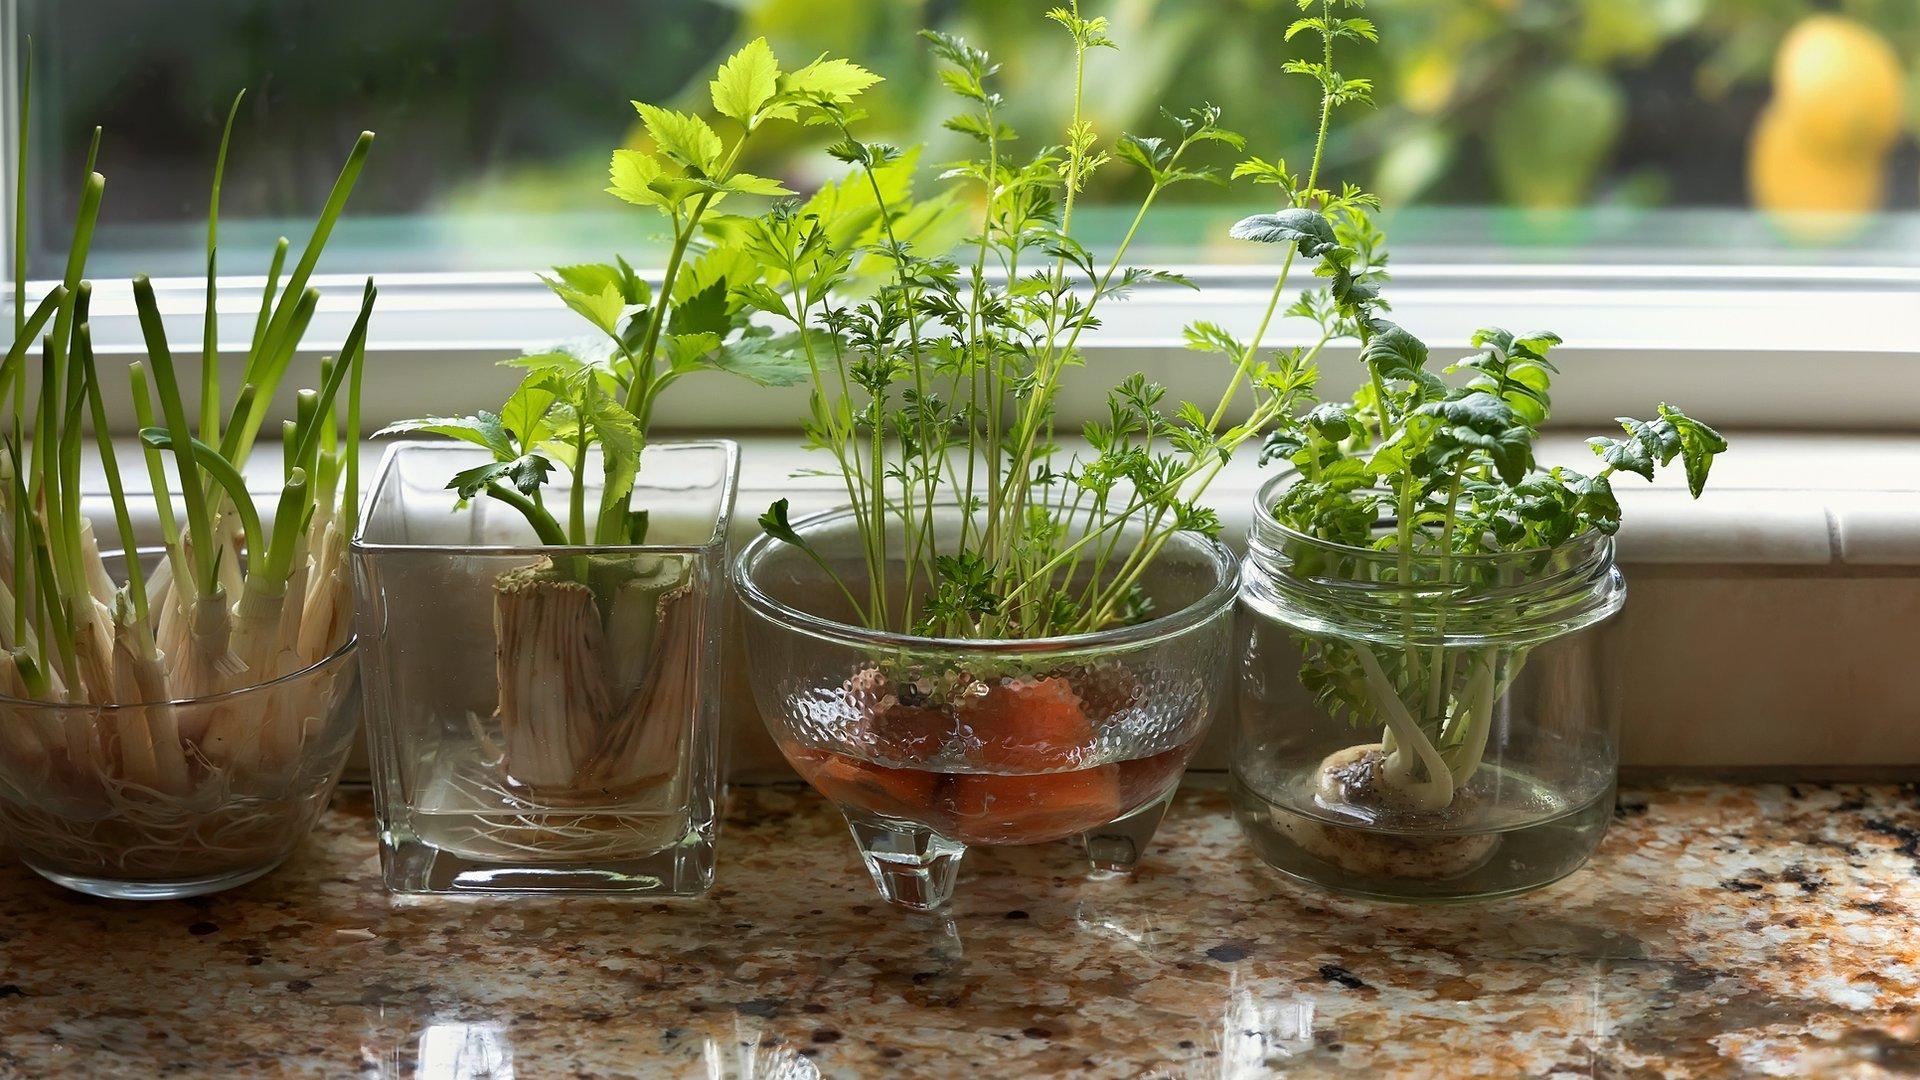 Regrowing Mit diesen Tipps klappt das Gemüse Recycling   familie.de